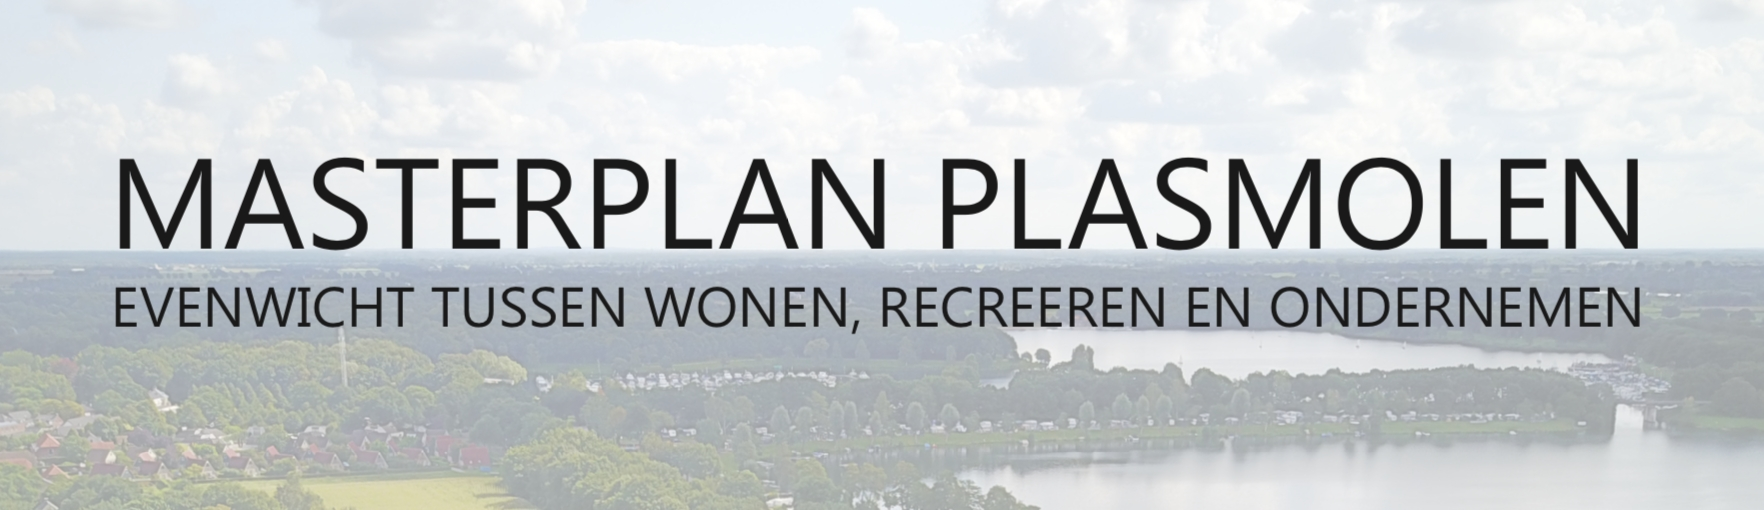 Masterplan Plasmolen